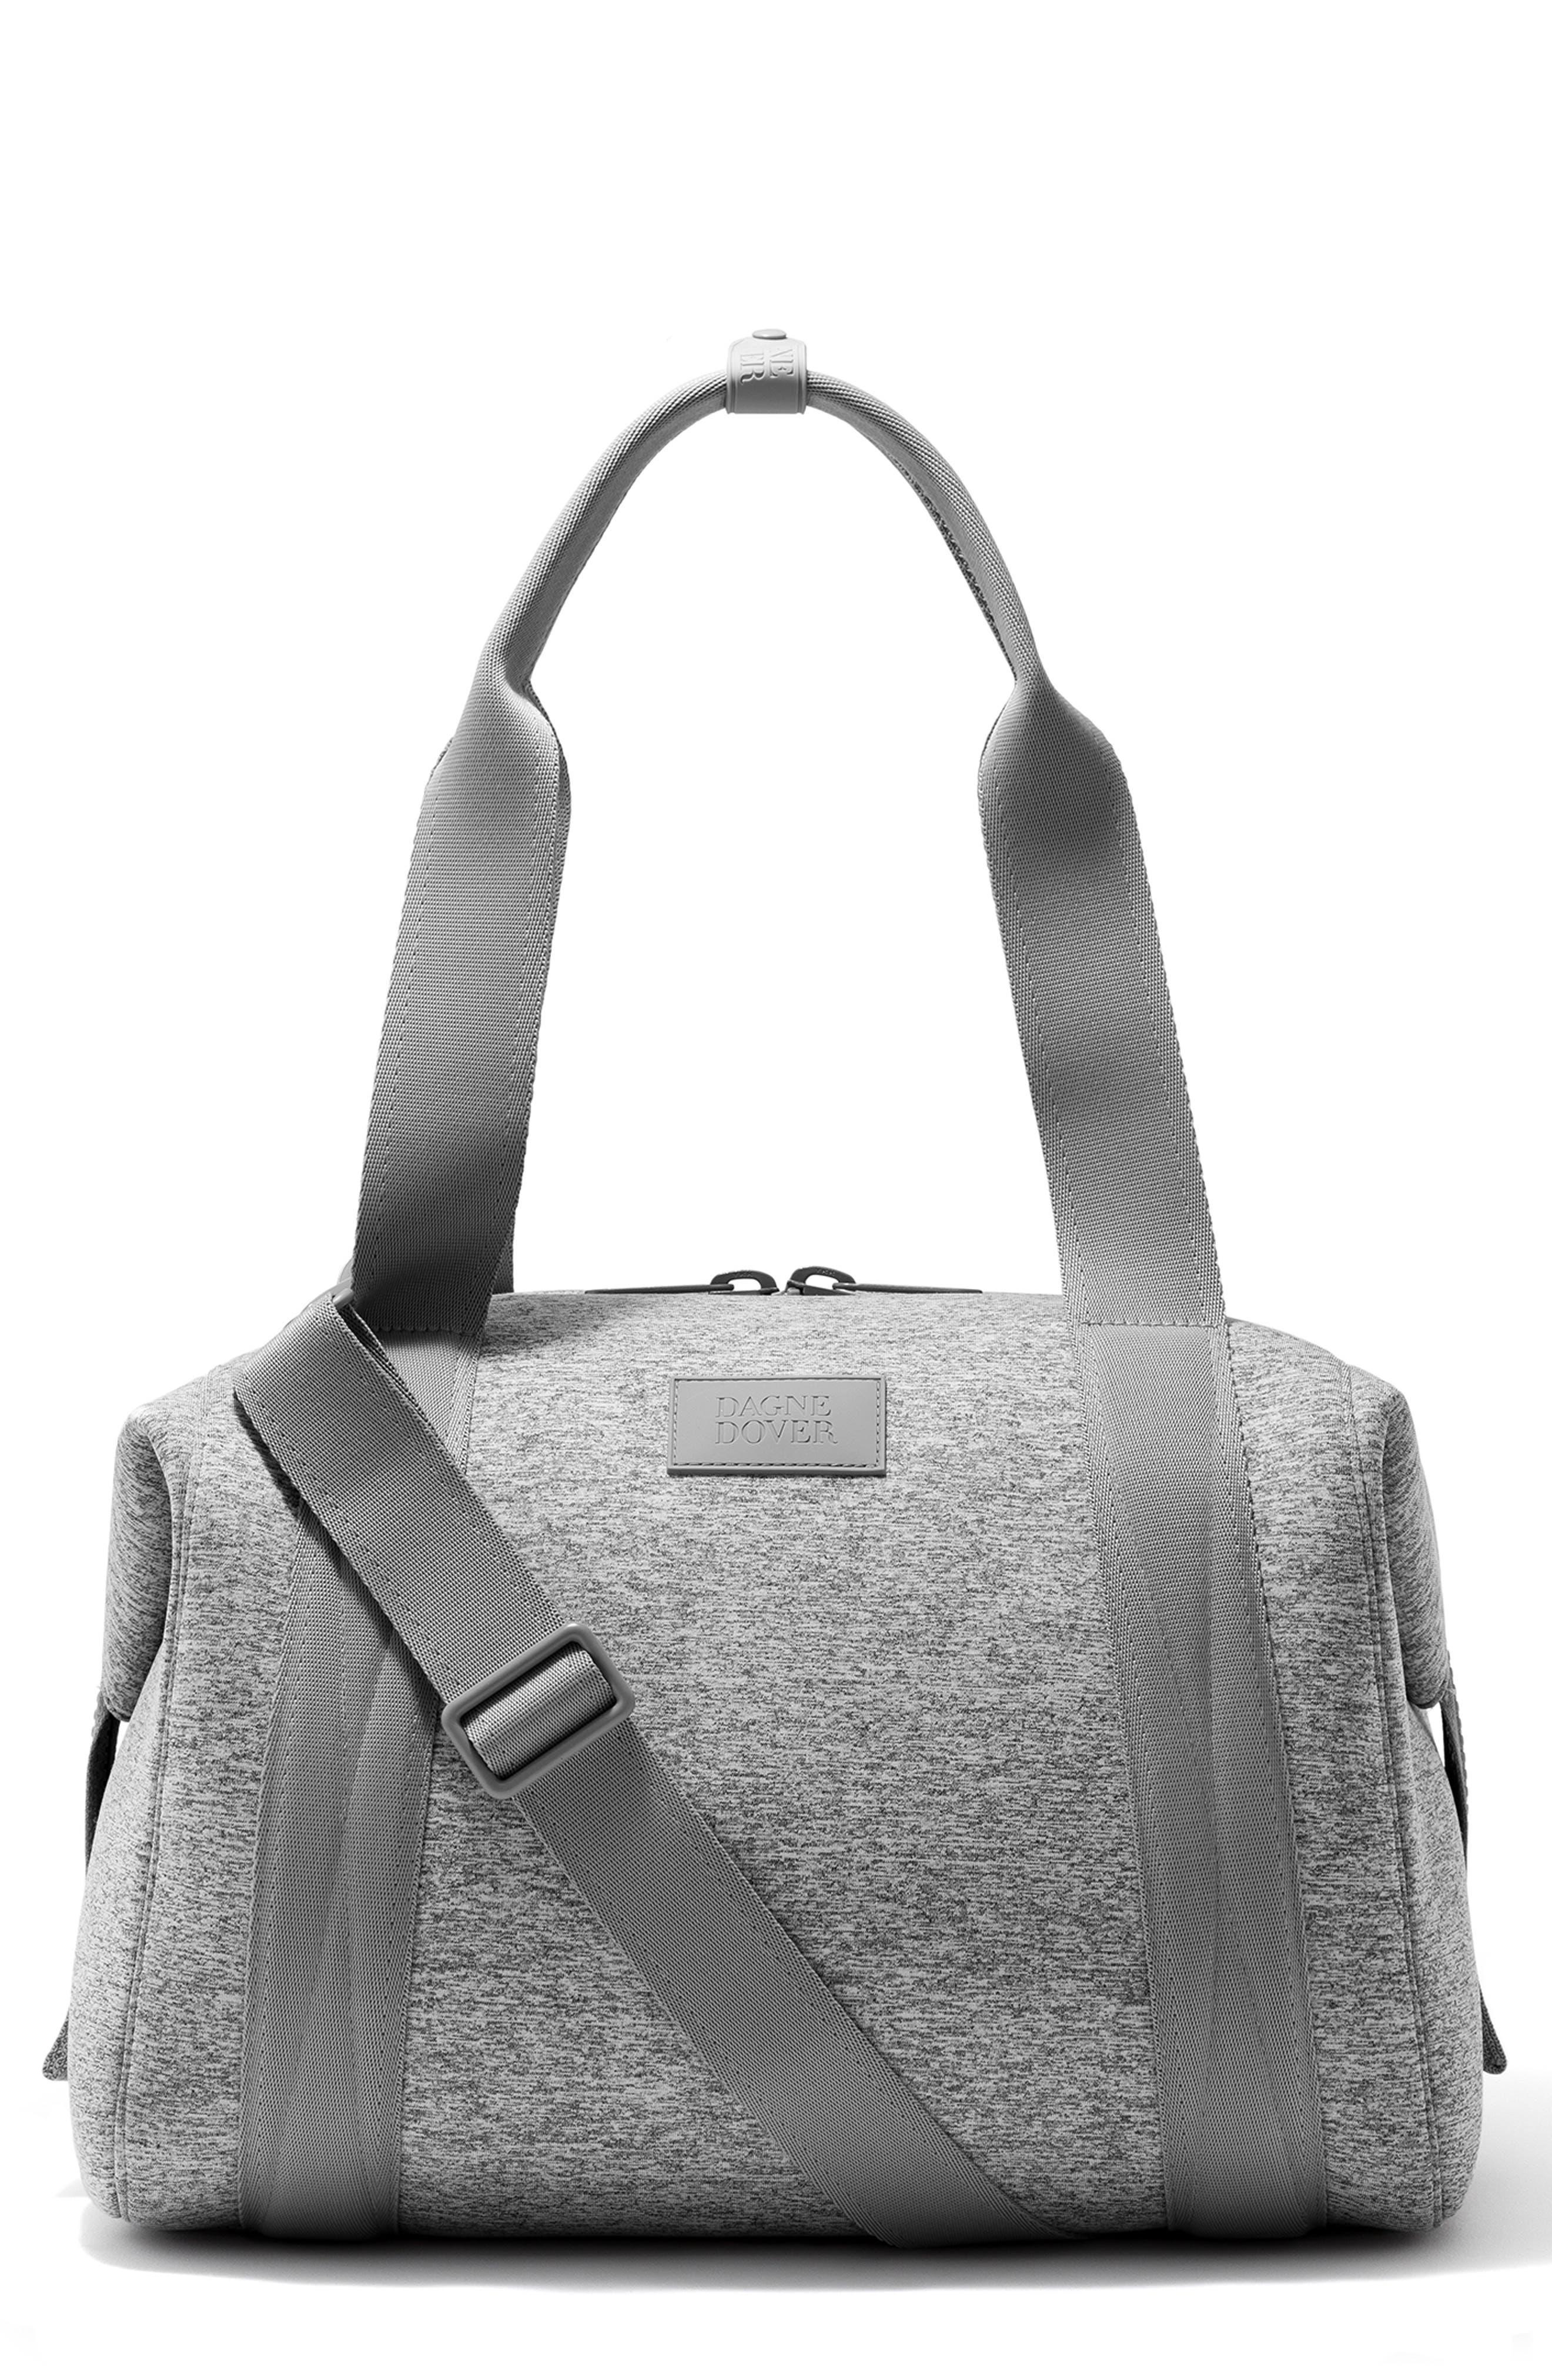 365 Medium Landon Neoprene Carryall Duffel Bag,                             Main thumbnail 1, color,                             HEATHER GREY